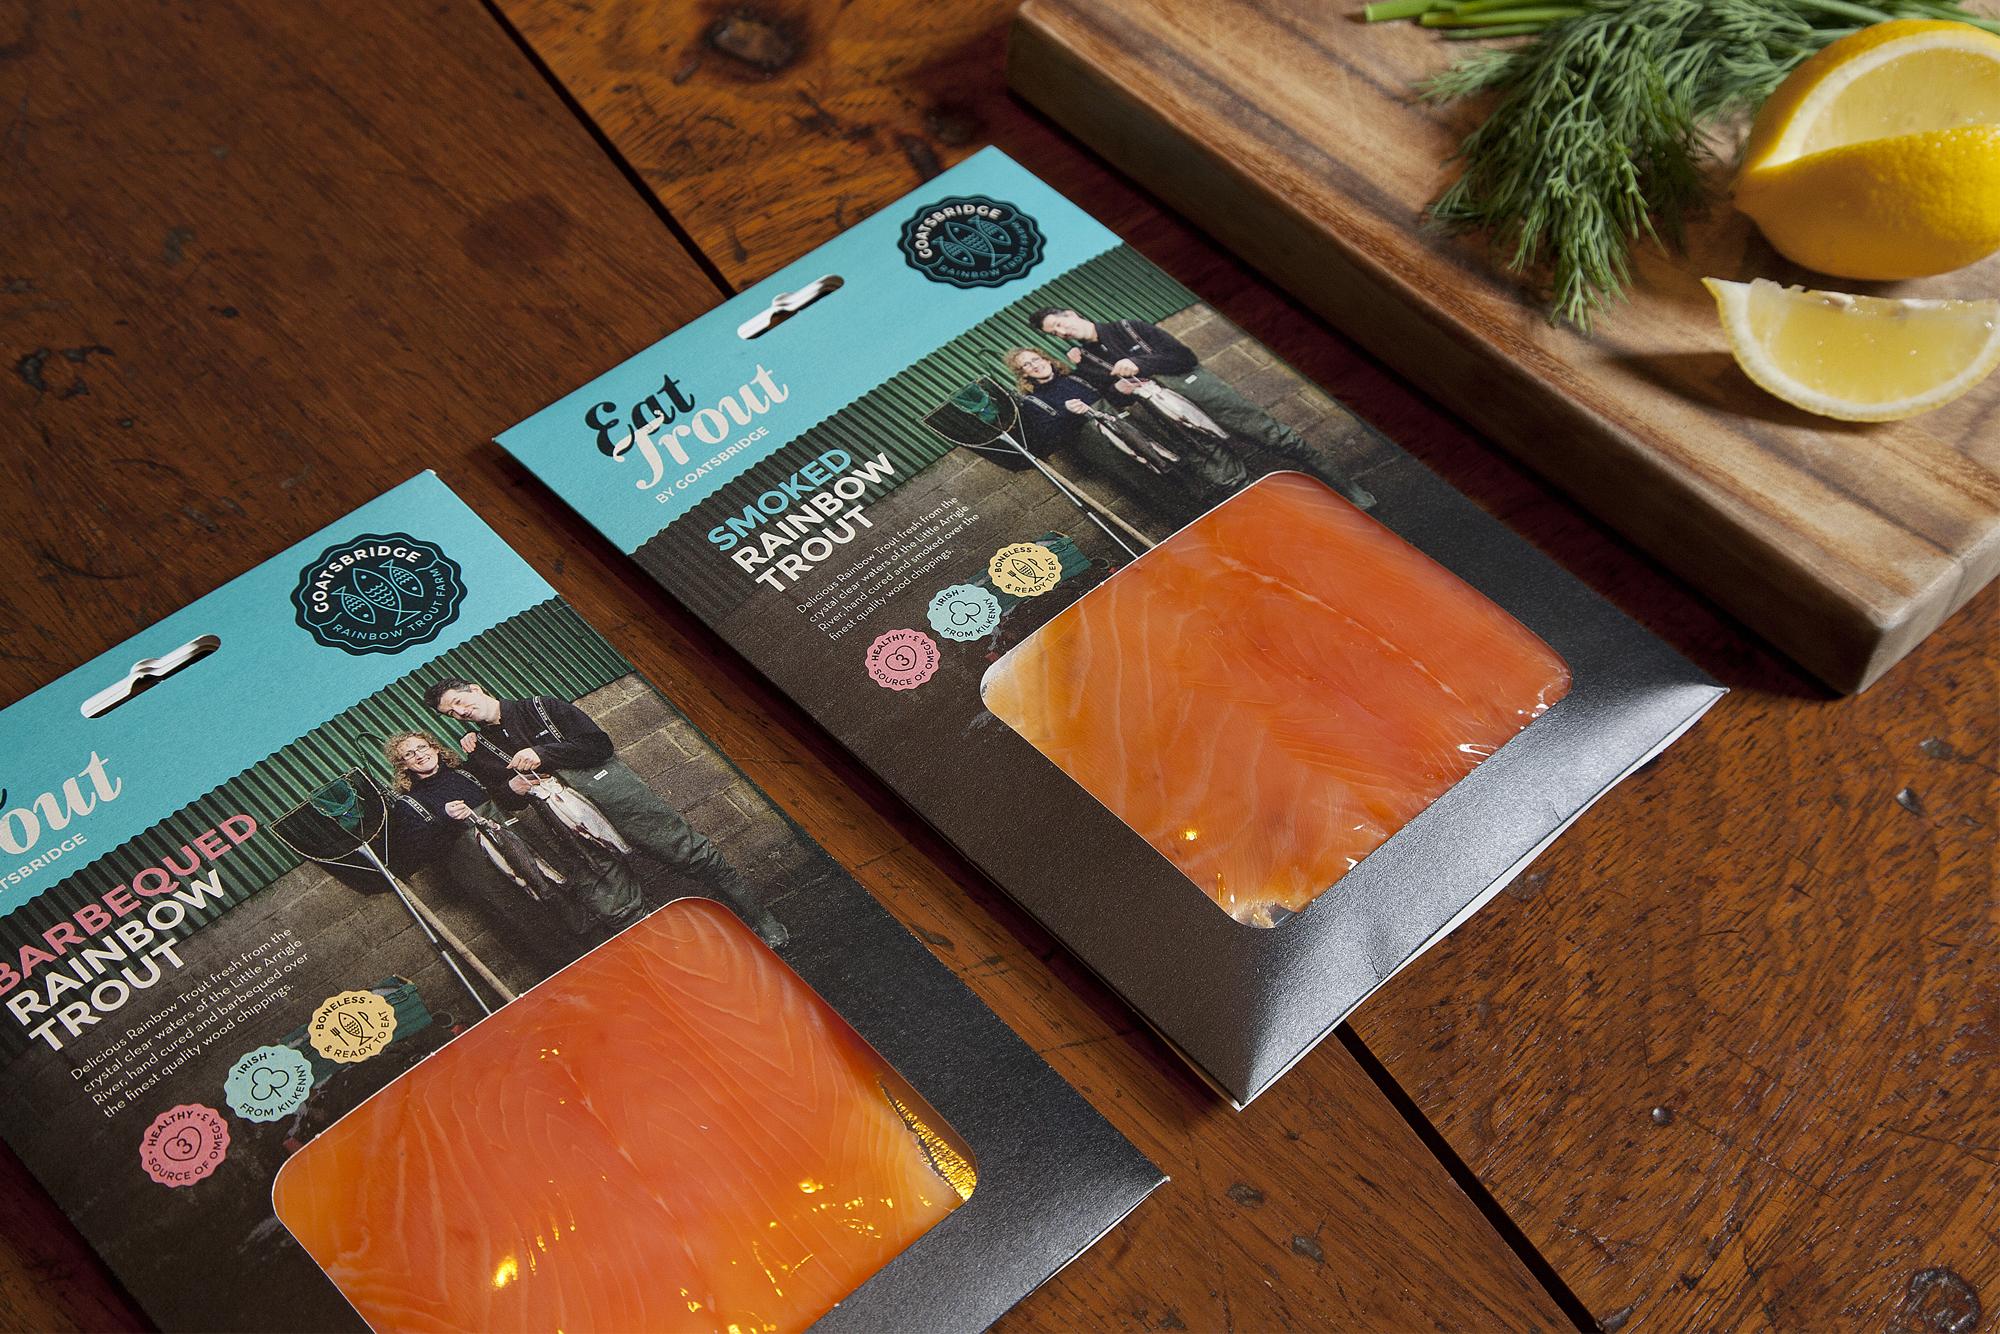 Cover image: Eat Trout by Goatsbridge (2014)